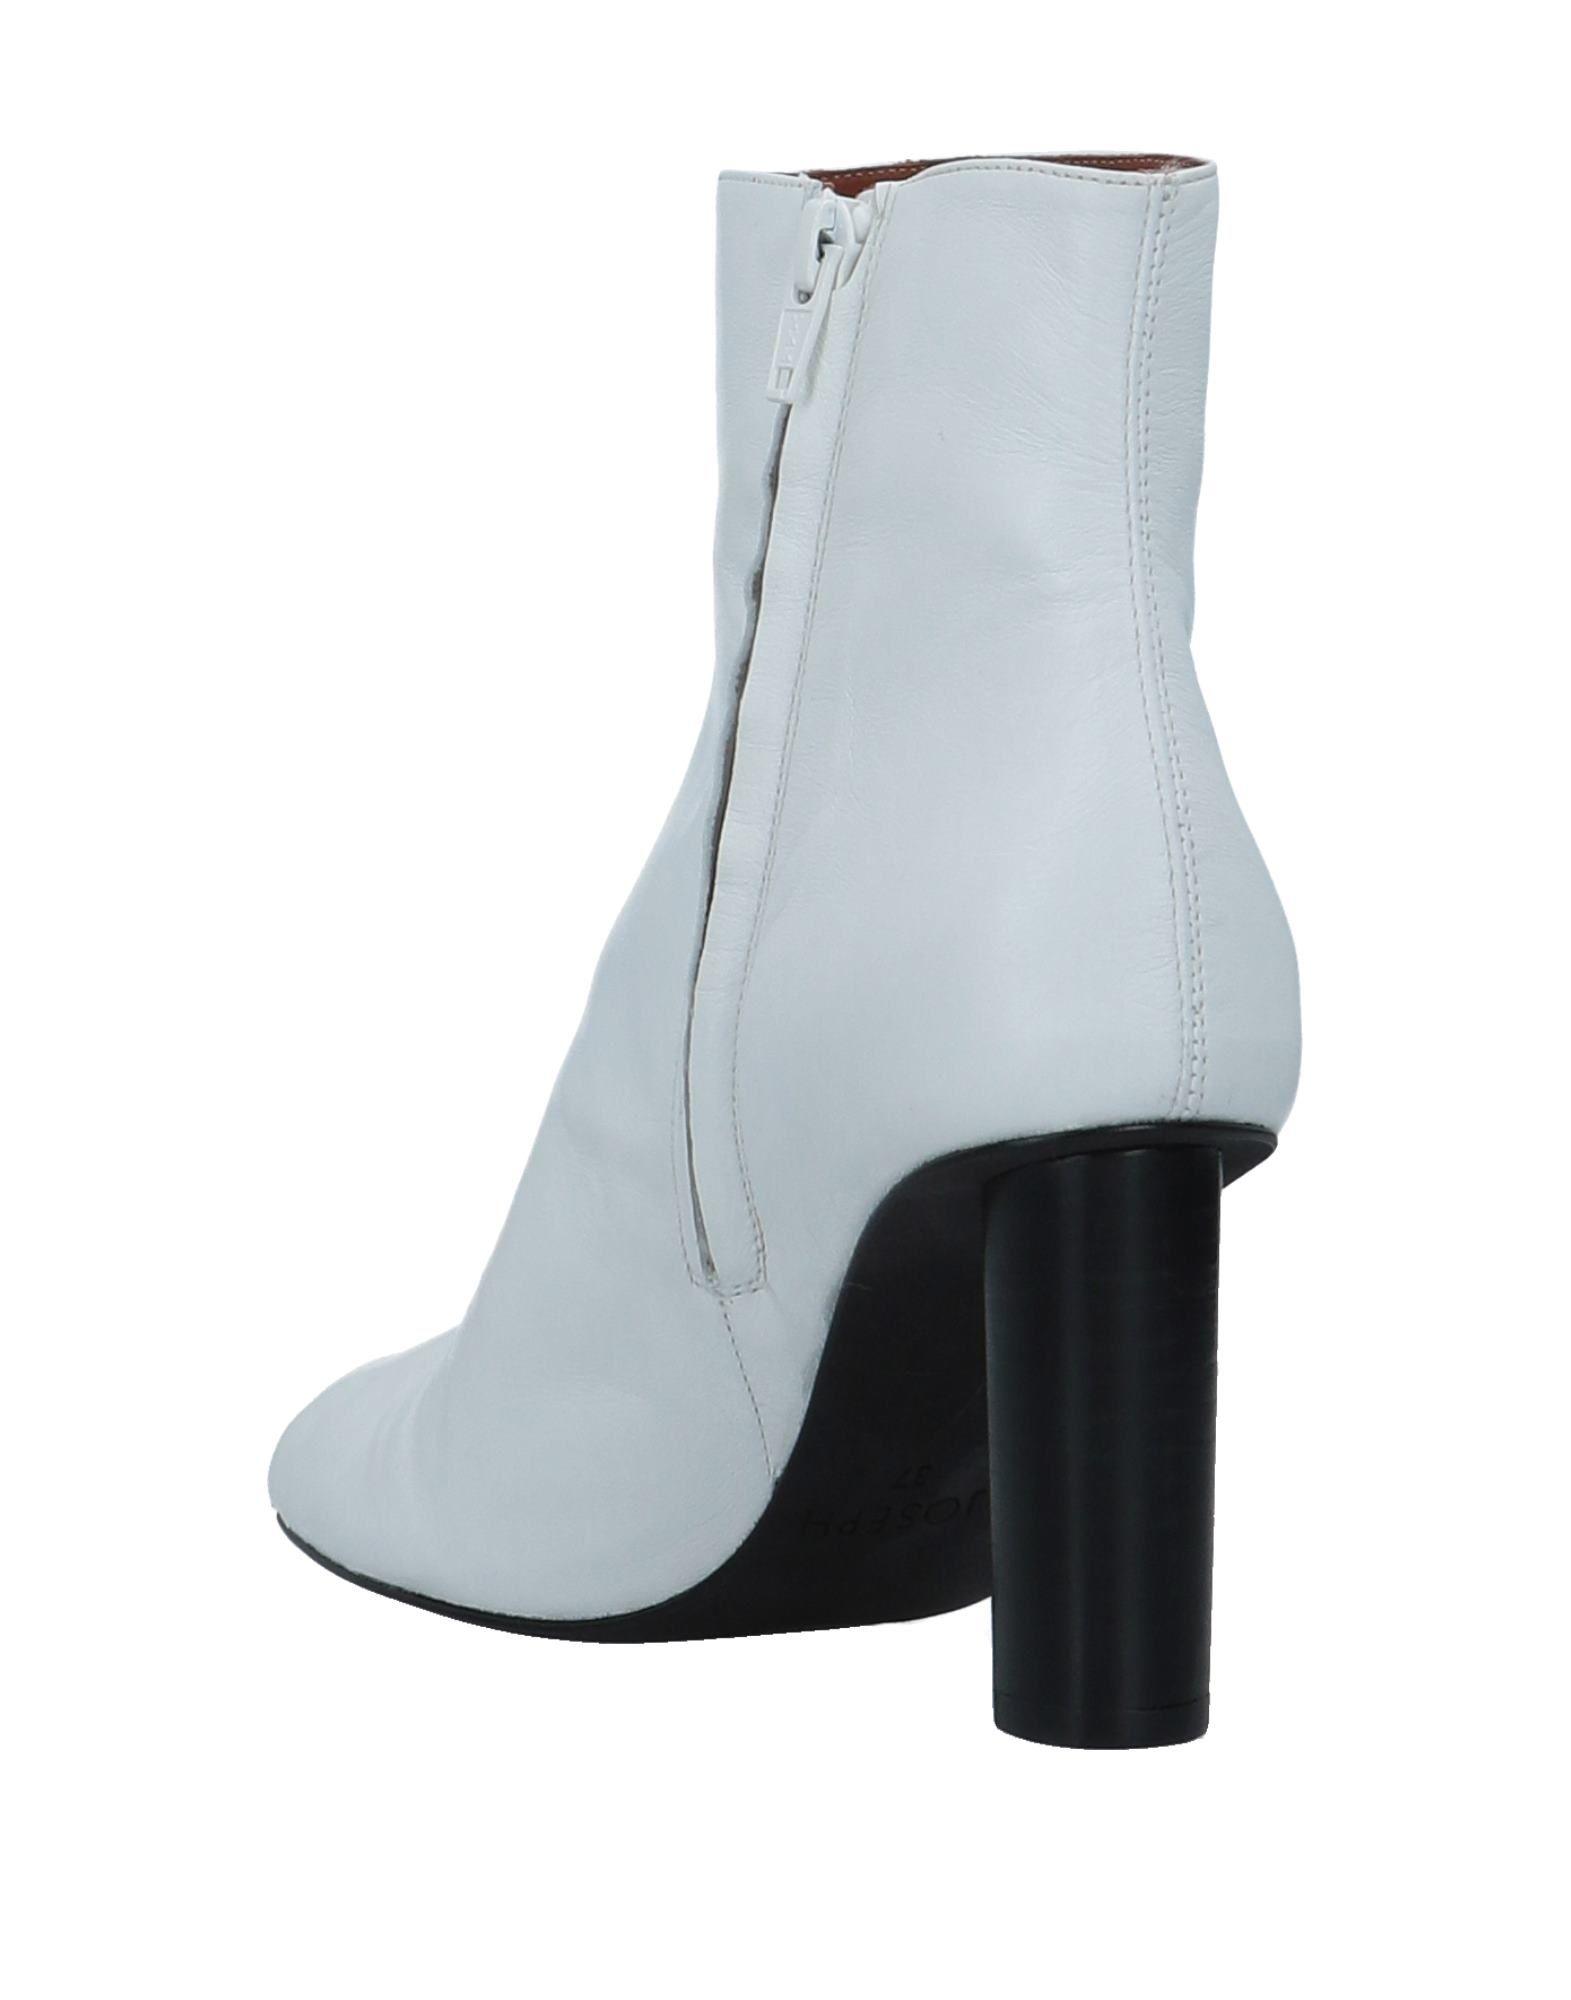 Rabatt Schuhe Stiefelette Joseph Stiefelette Schuhe Damen  11538943GL 95f723